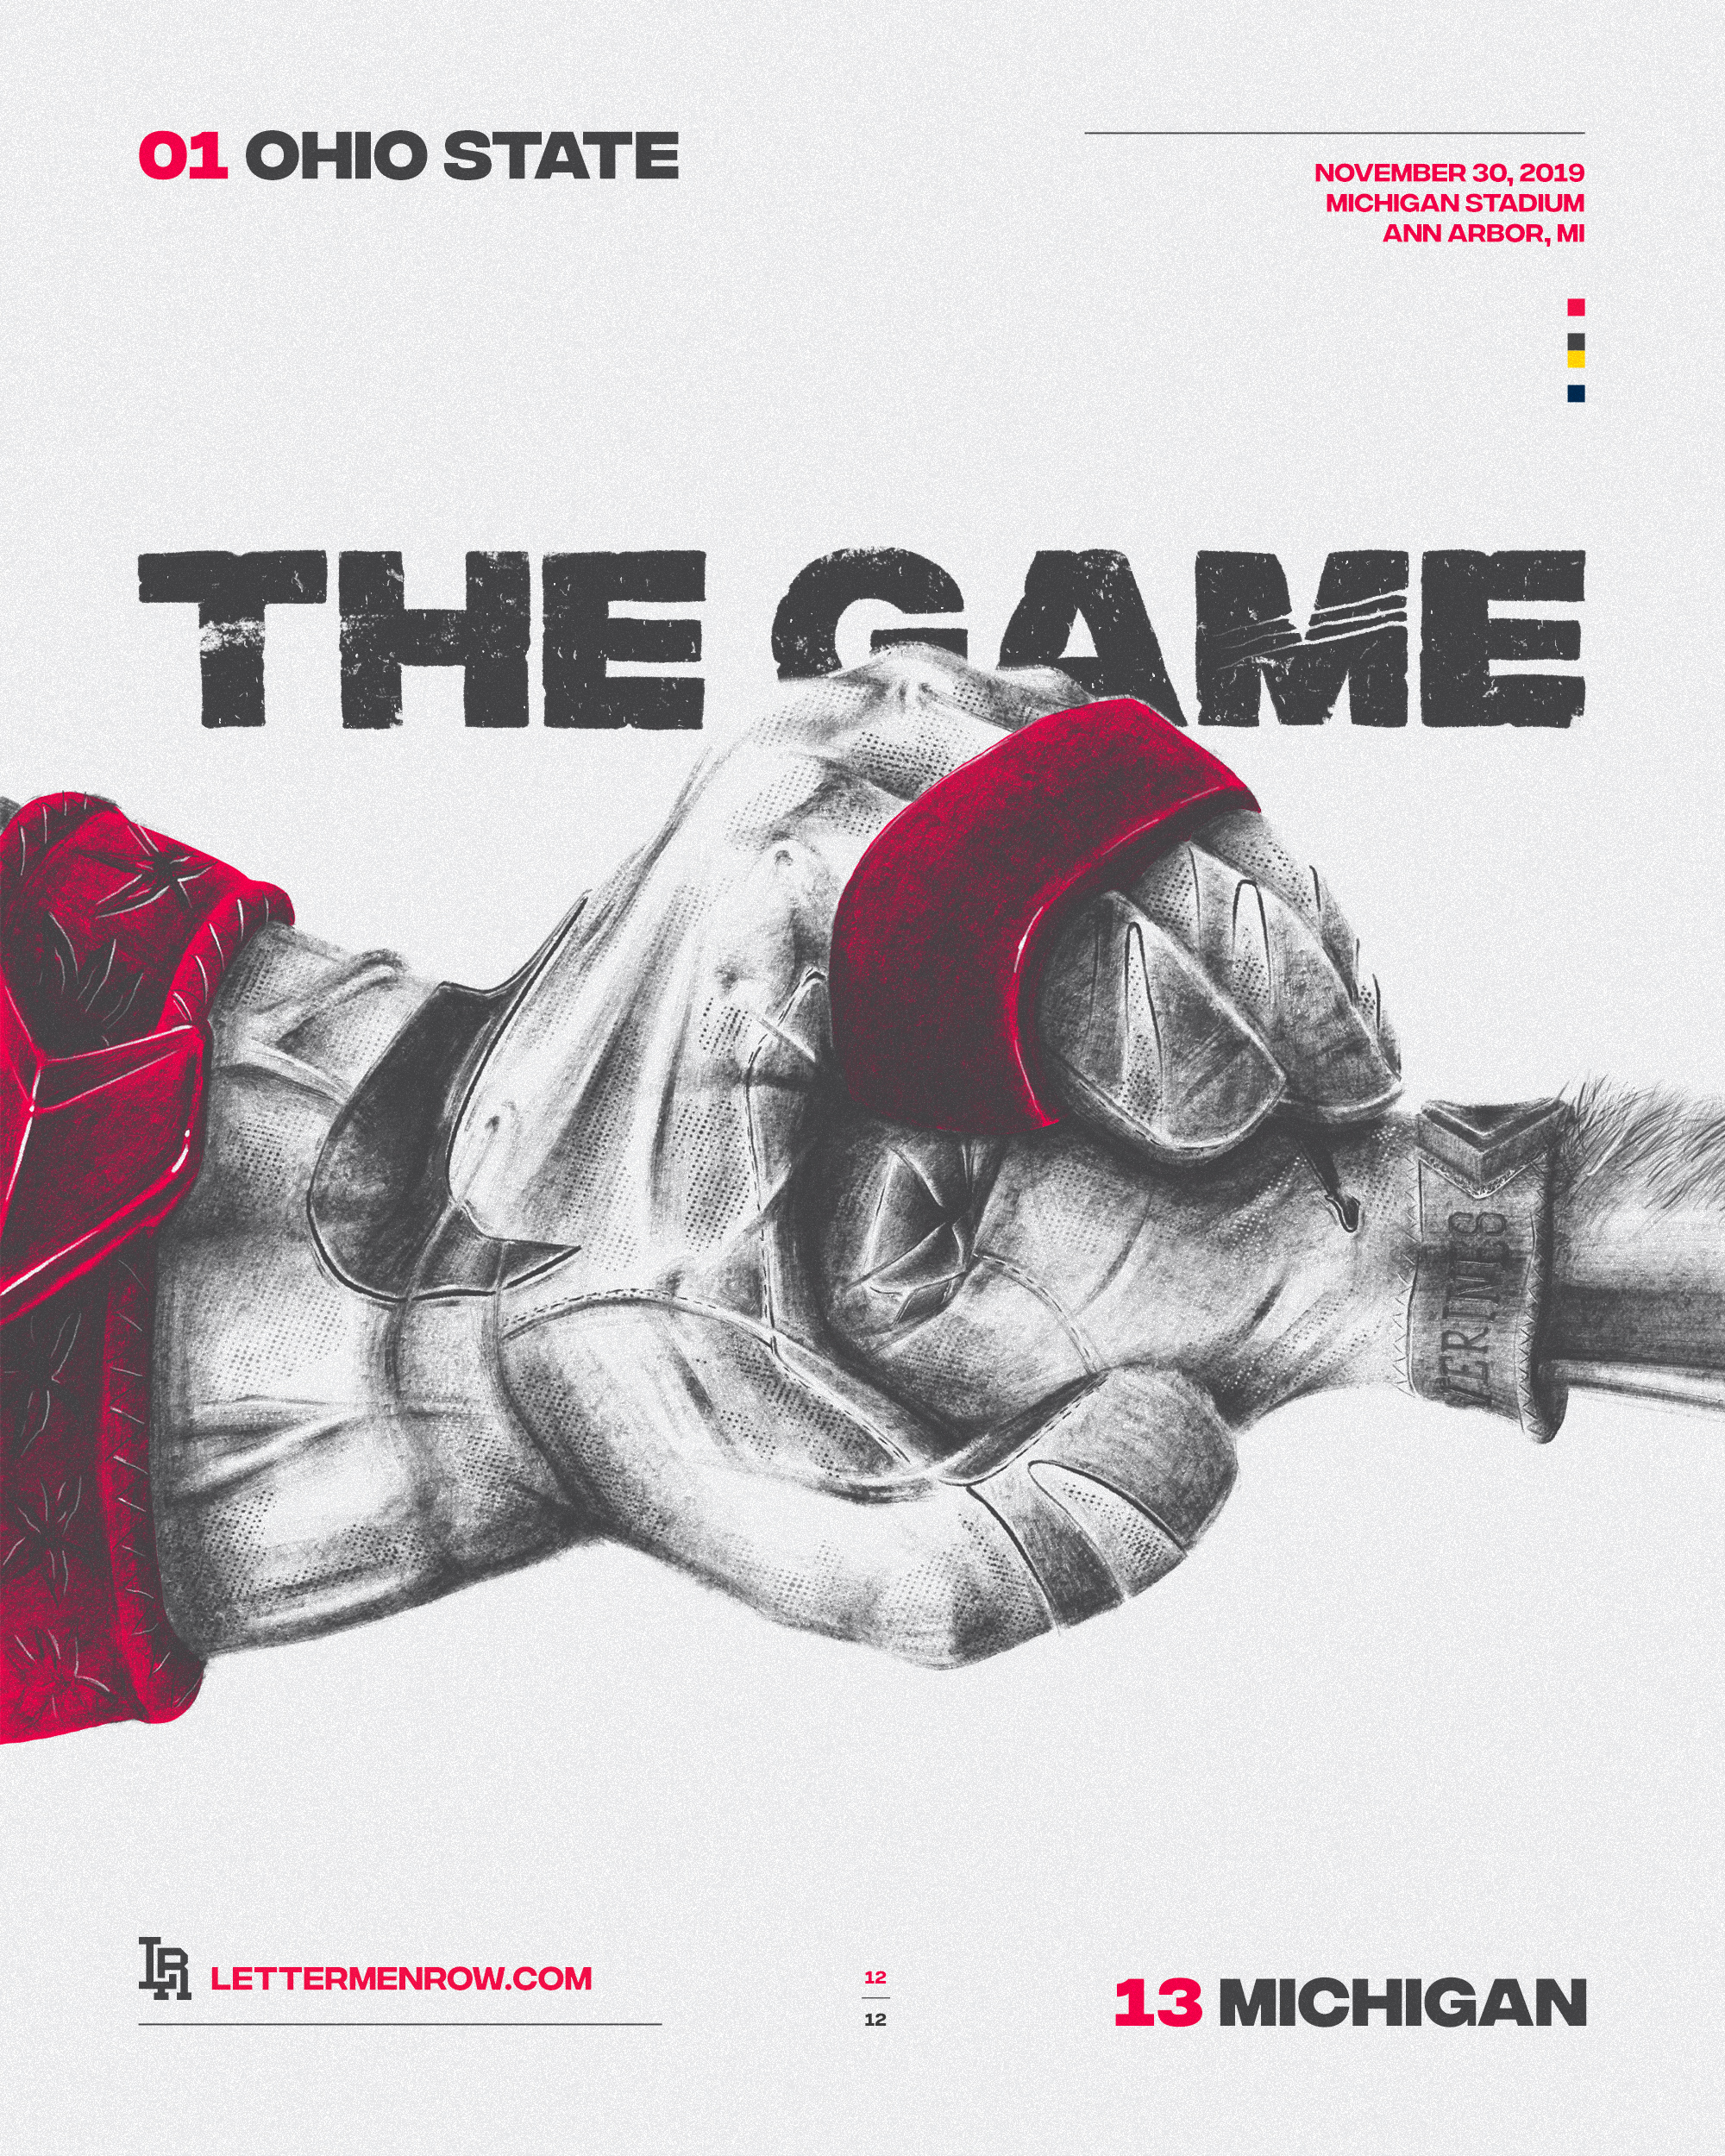 Ohio State-Ohio State football-buckeyes-game poster